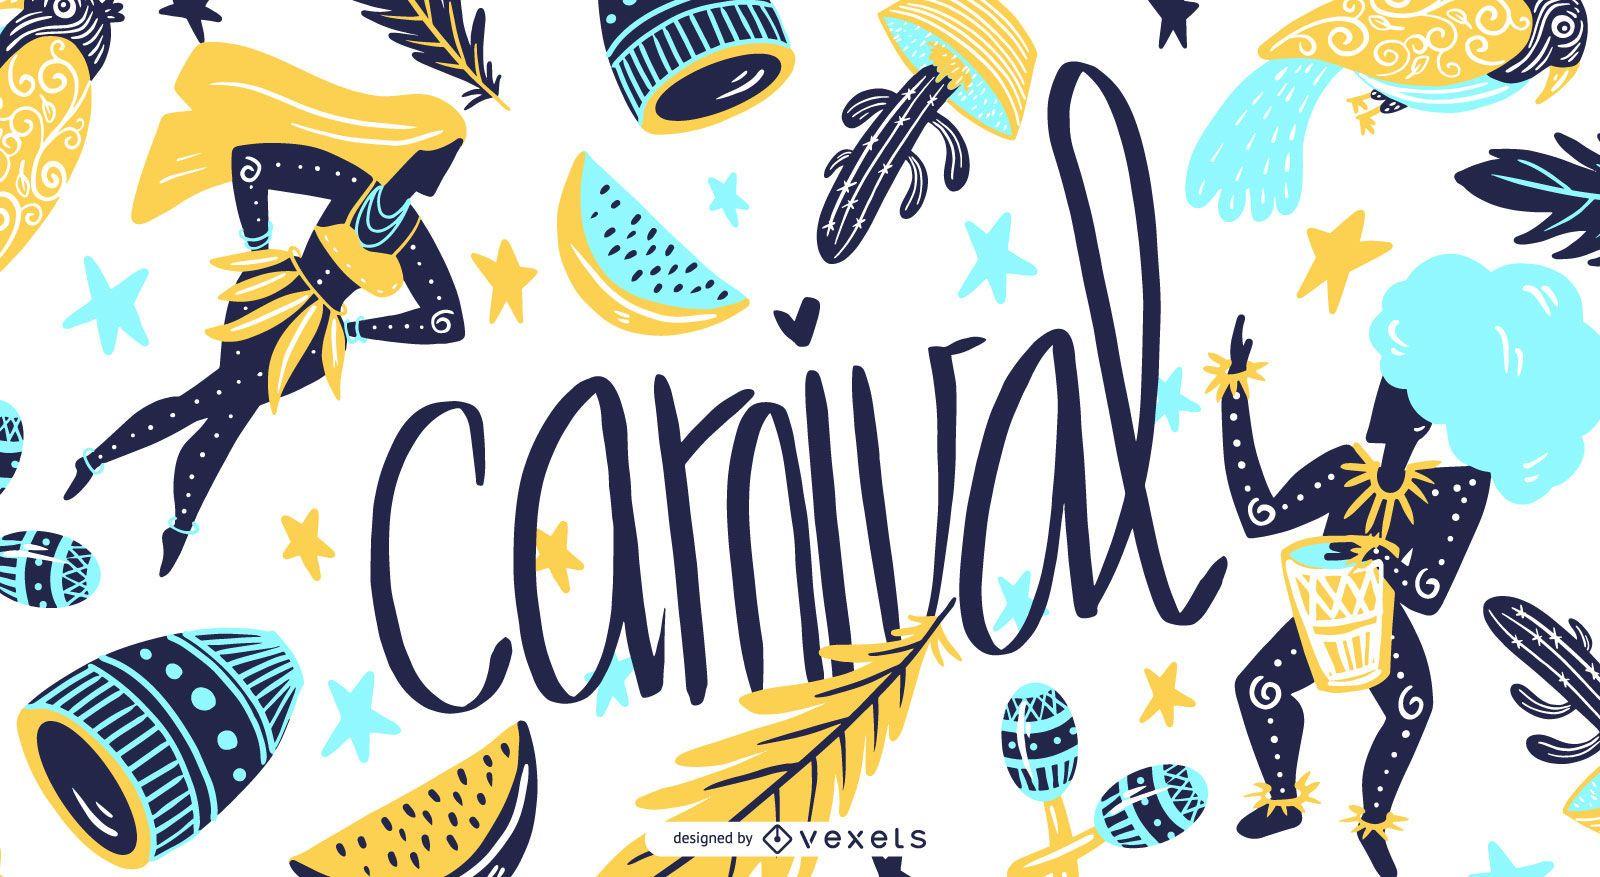 Carnival Seasonal Illustration Graphic